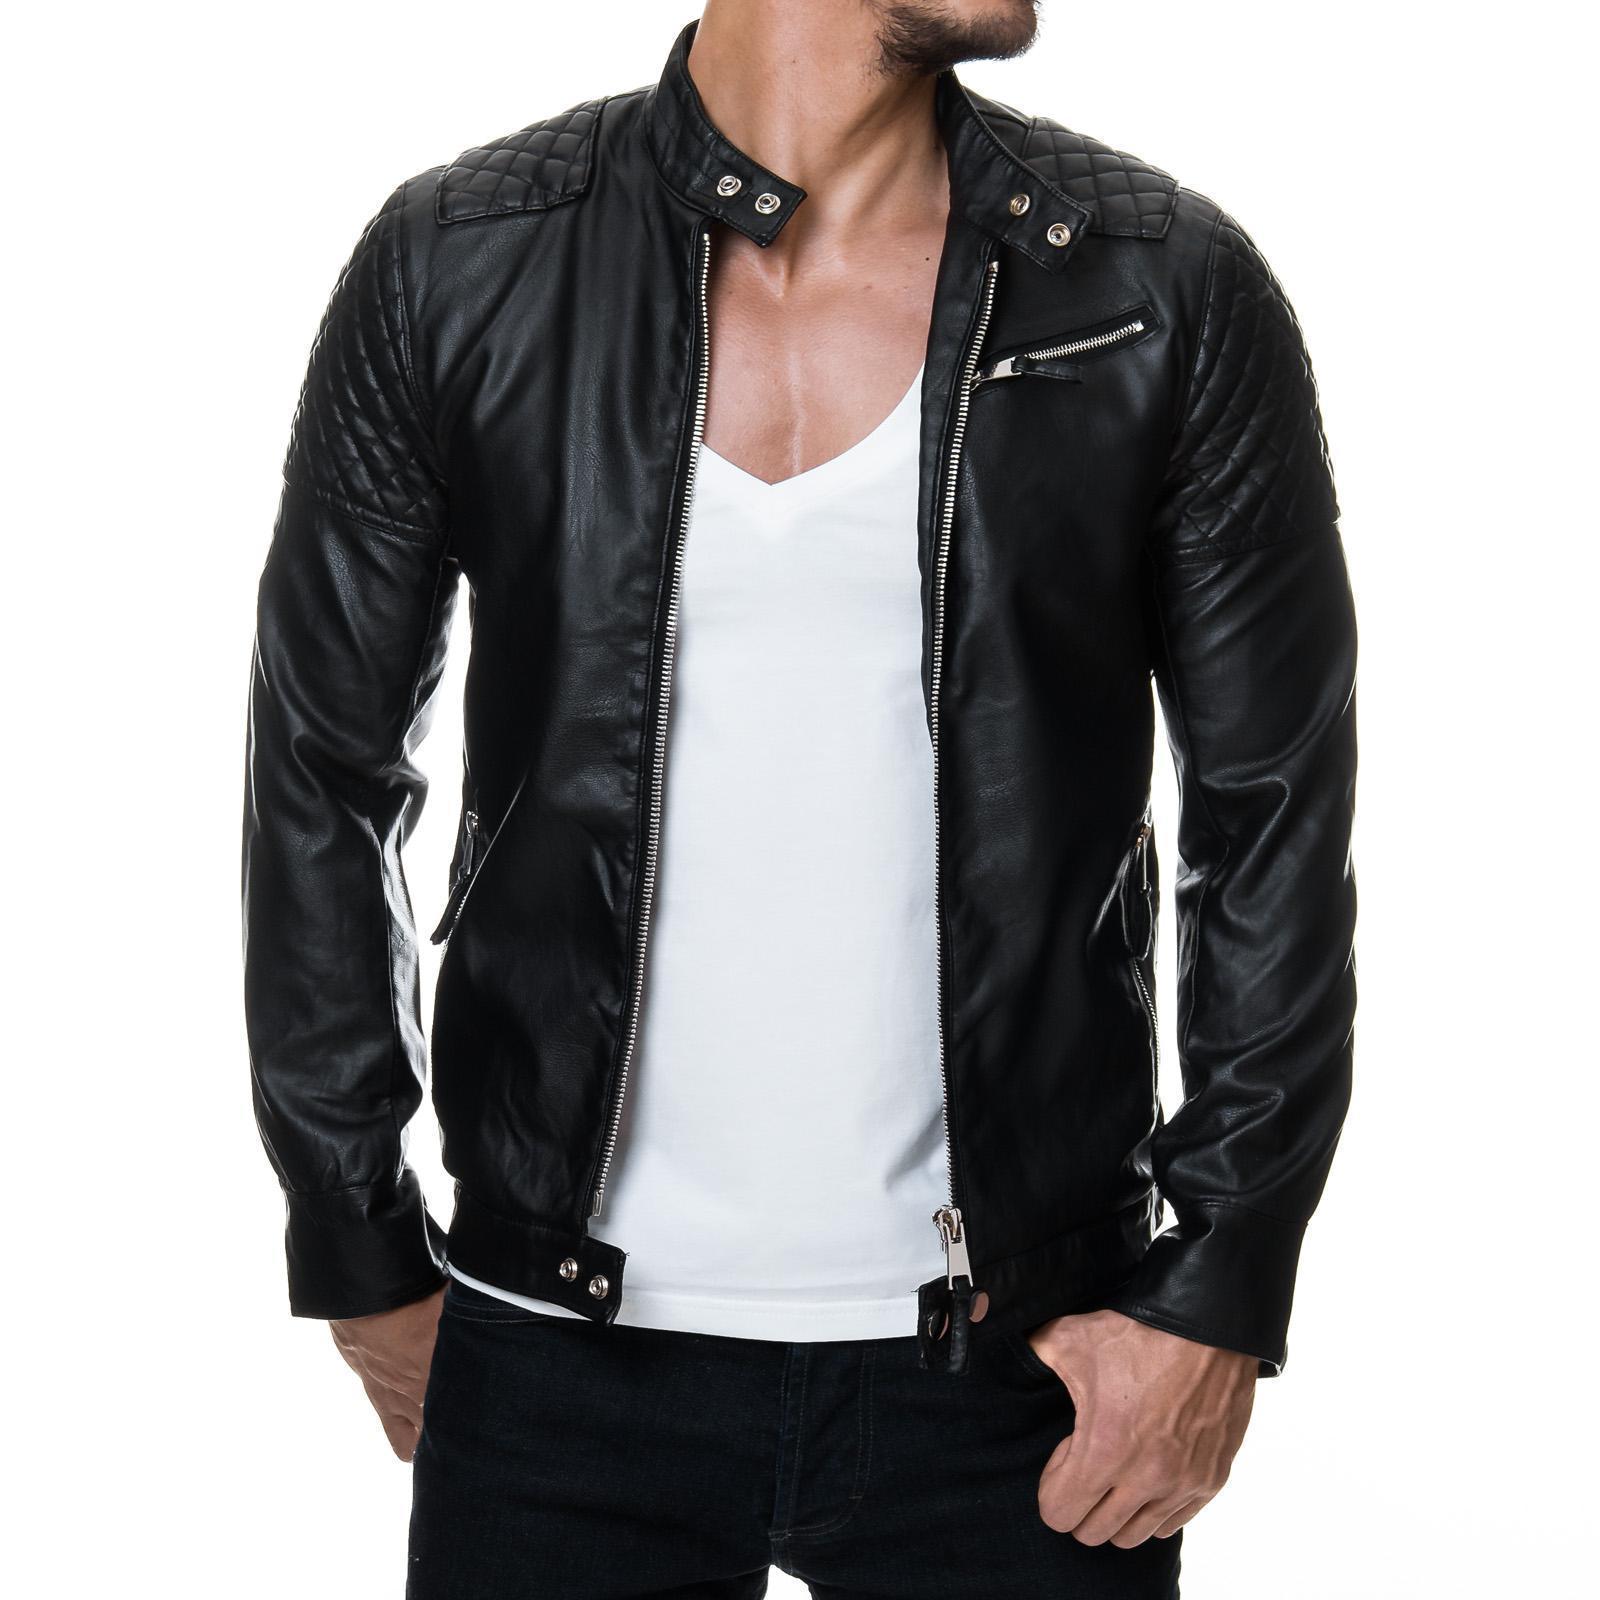 Prestige Homme 08 Herren Biker Jacke PU Kunst Lederjacke Gesteppt Club S-XXL